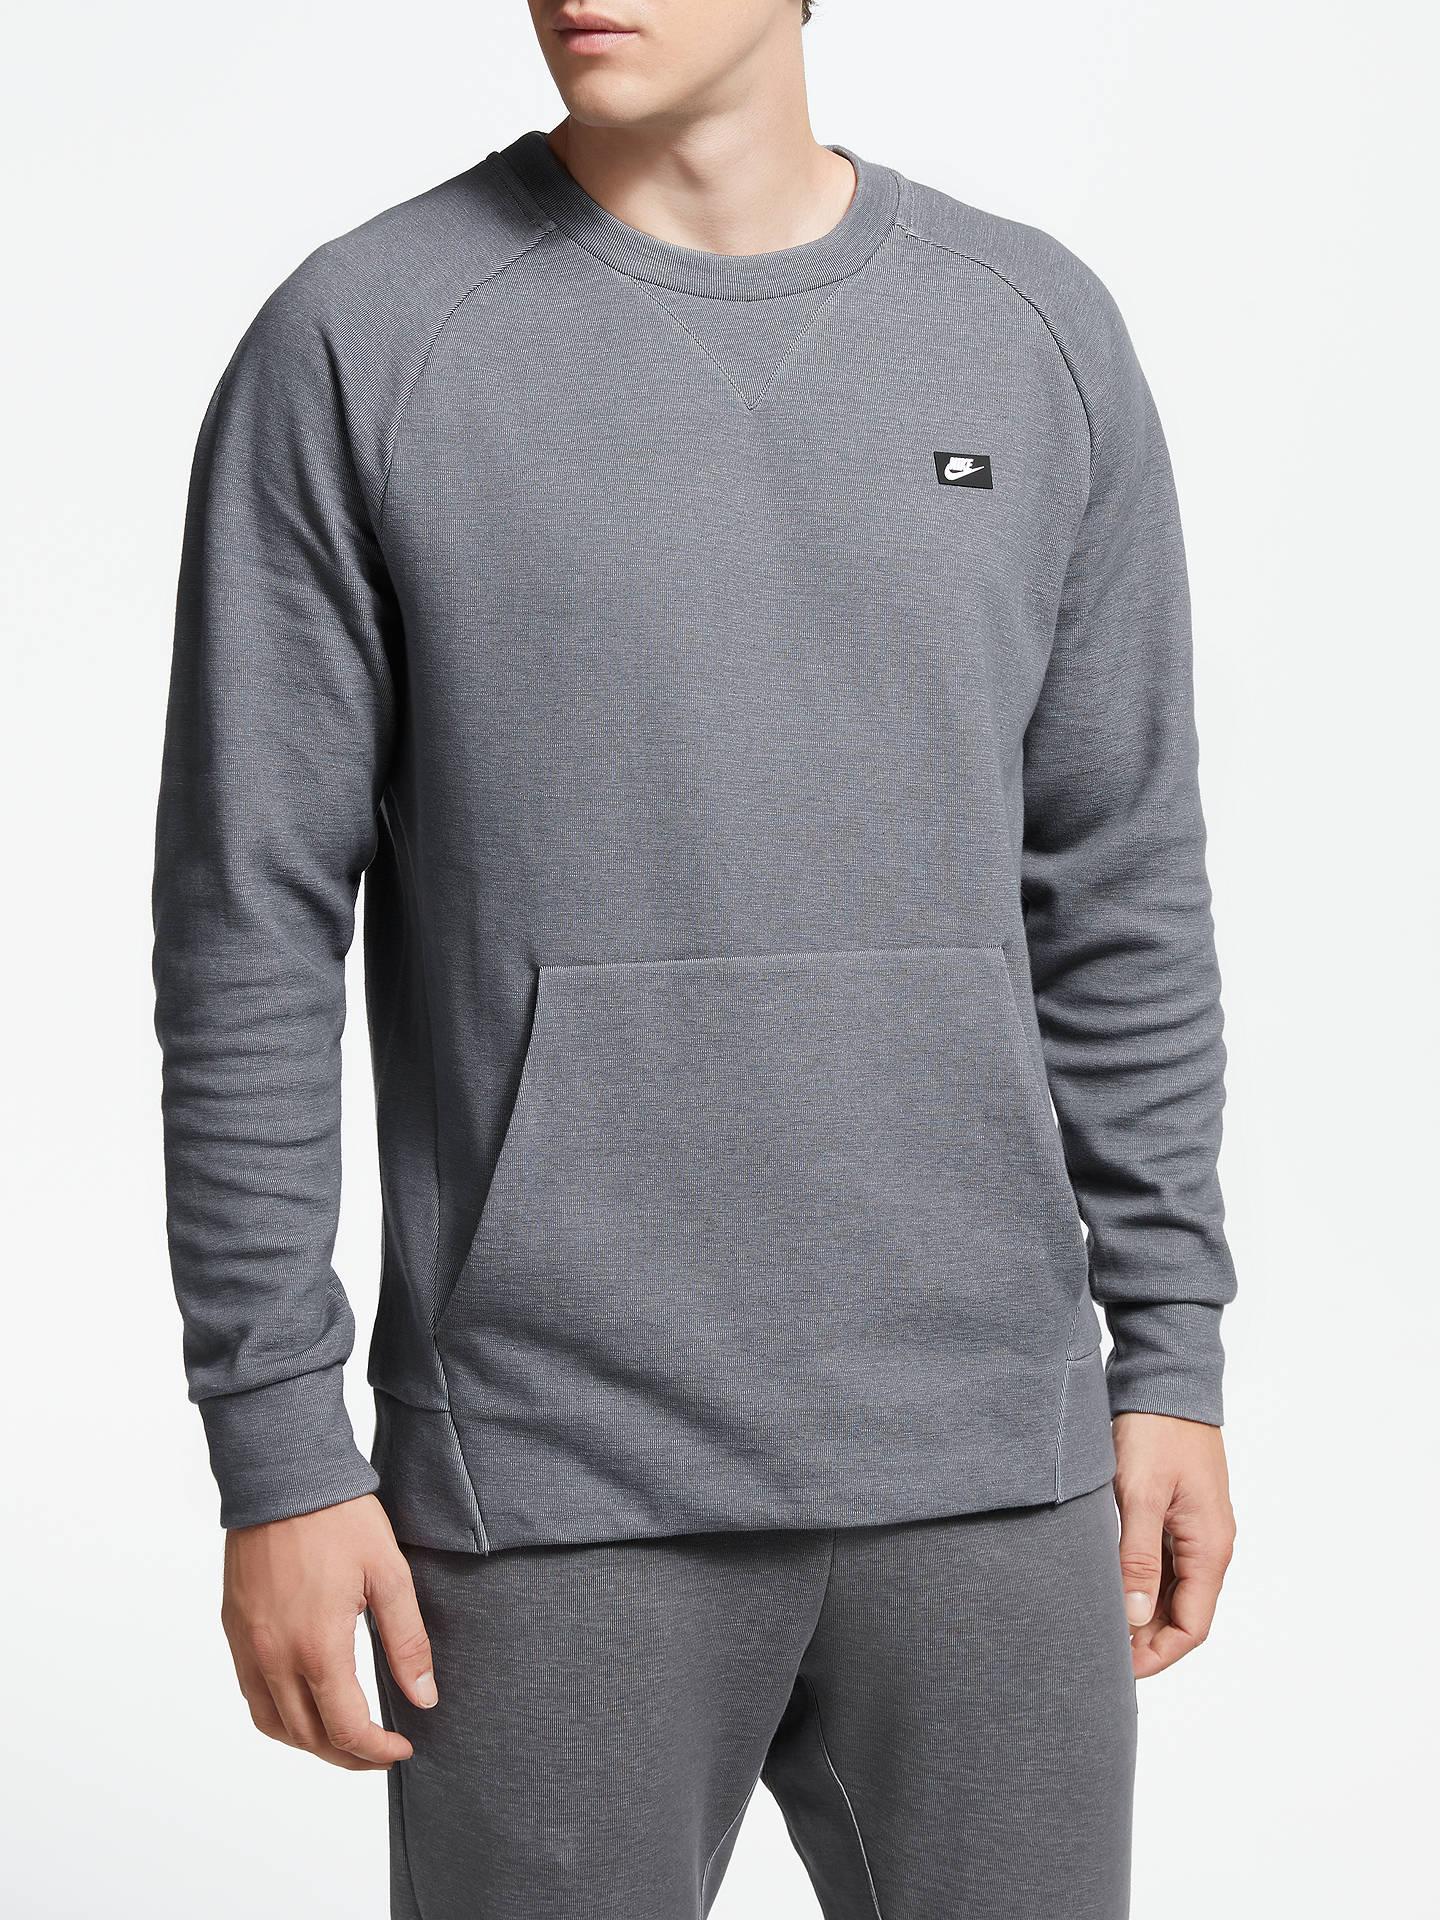 c4da3bbf2 Buy Nike Sportswear Optic Crew Neck Sweatshirt, Dark Grey/Heather, M Online  at ...